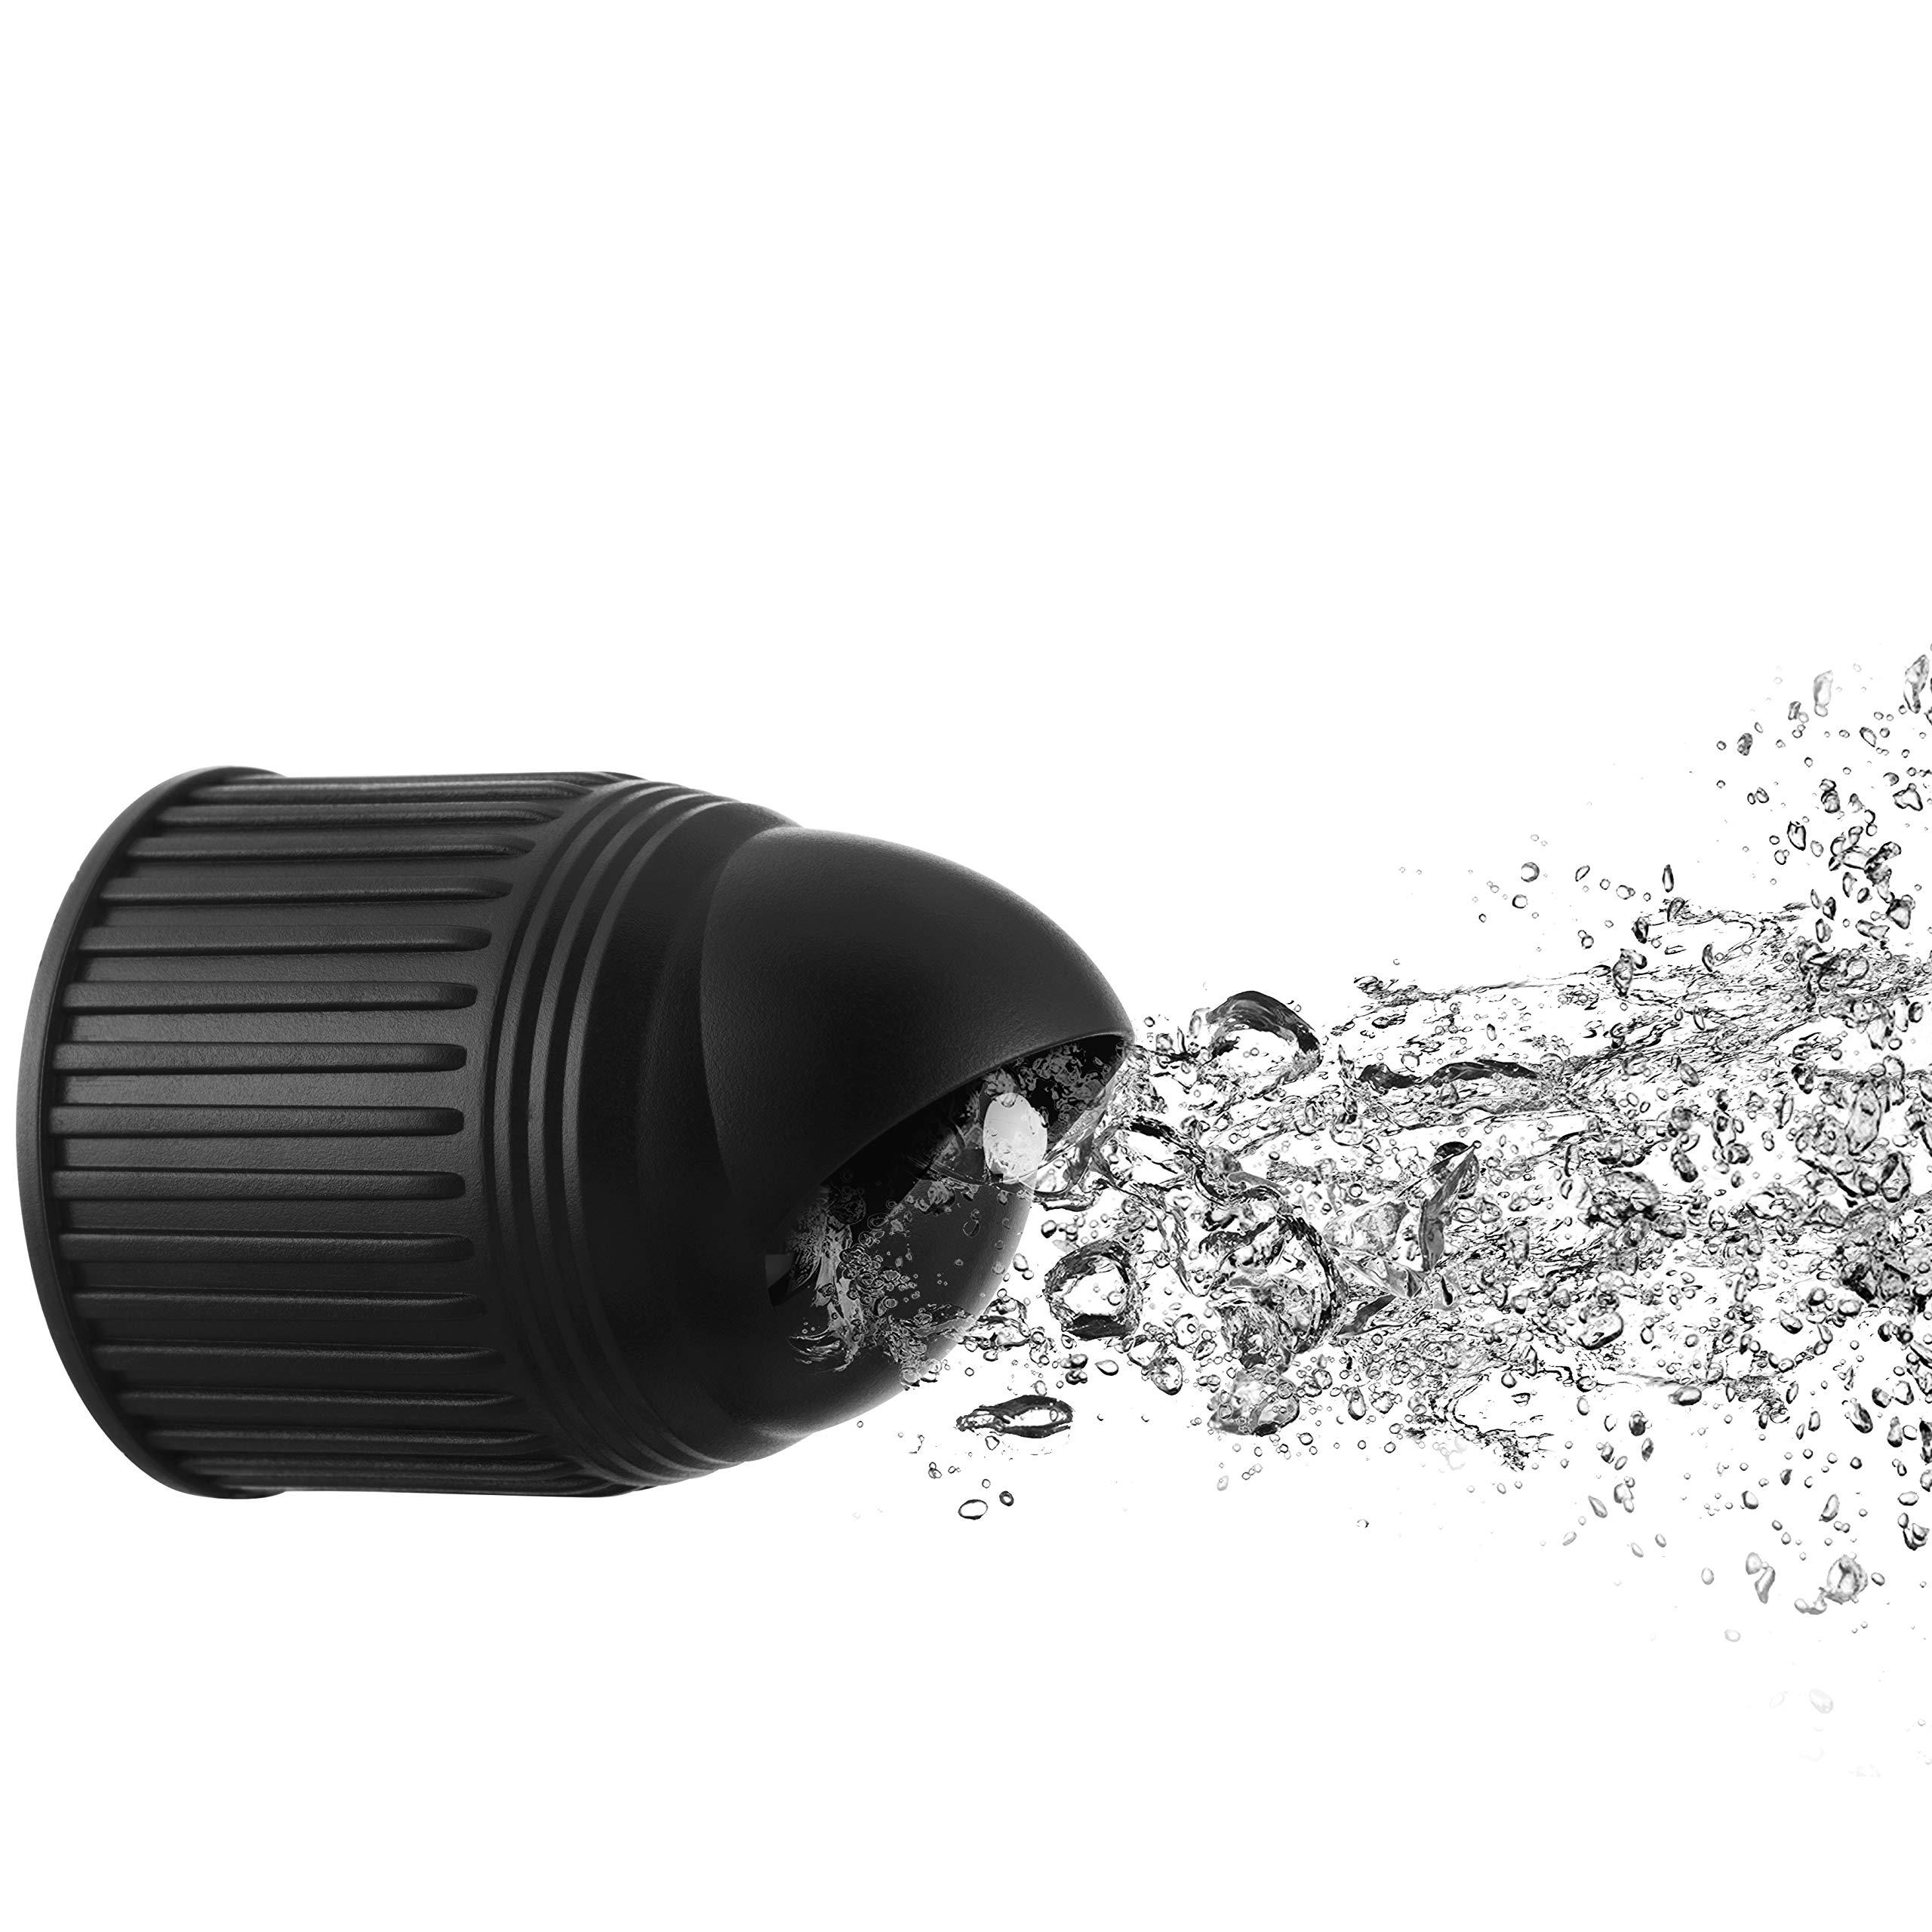 KASAN Aquarium Power Head and Wave Maker(Aquarium Circulation Power Head Needs to Match The Filter Pump) by KASAN